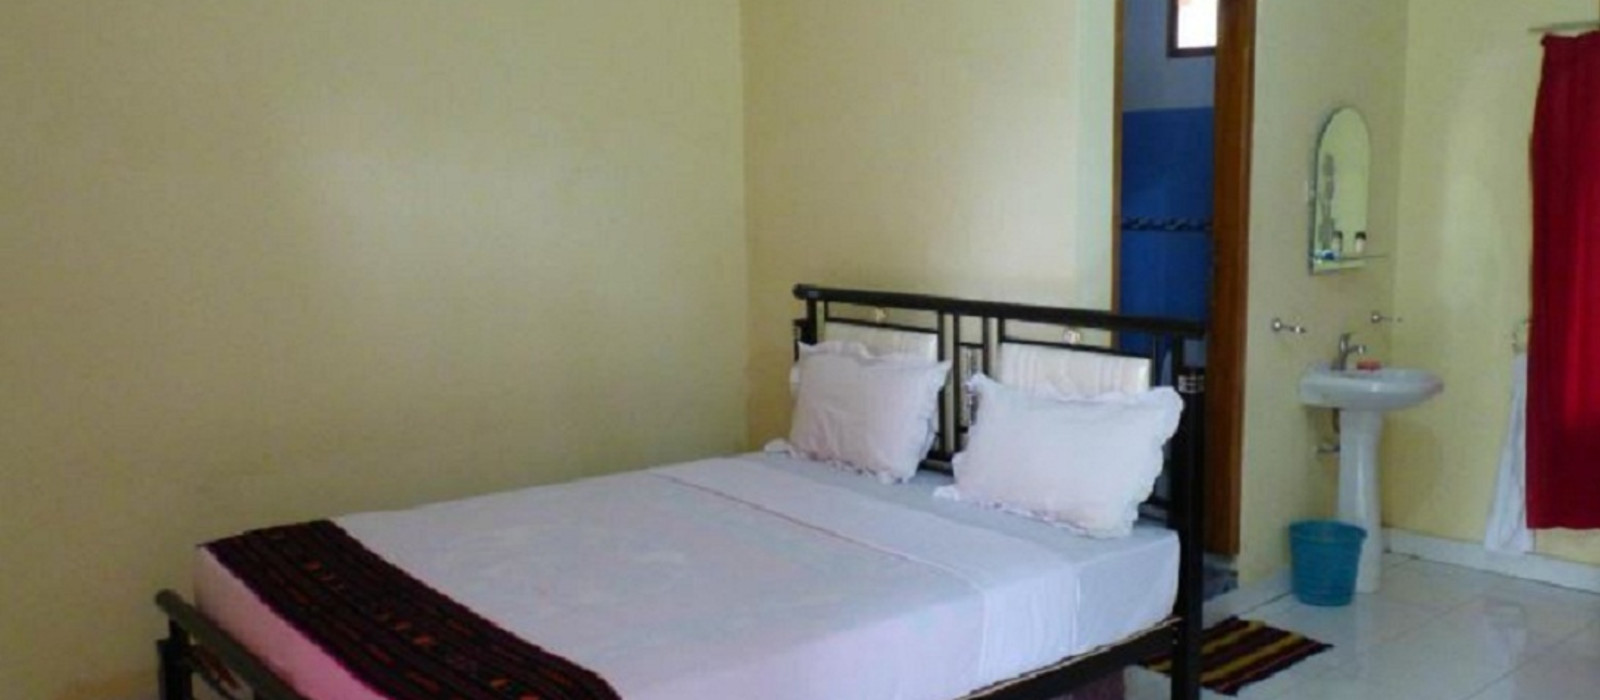 Hotel Silverin  Bajawa Indonesien